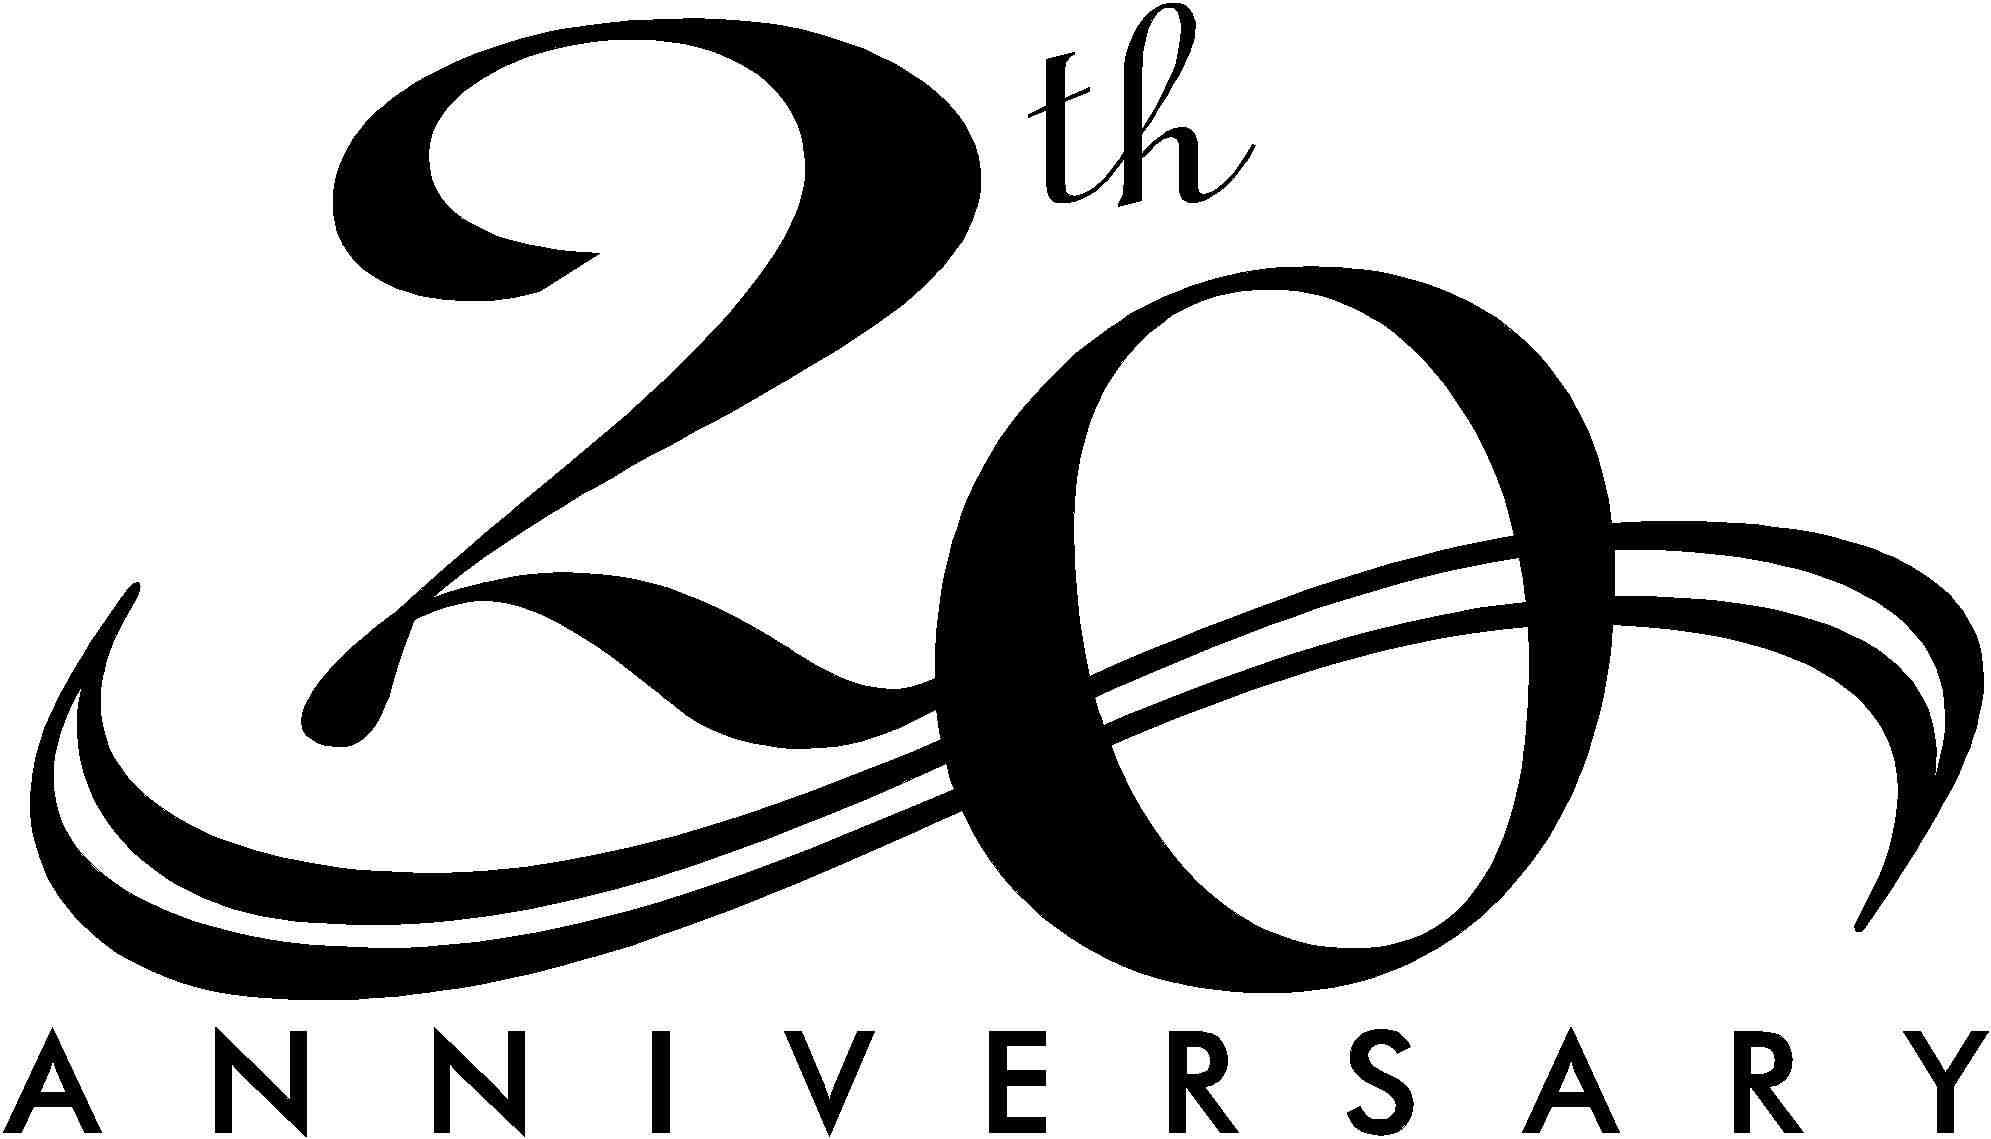 20_years